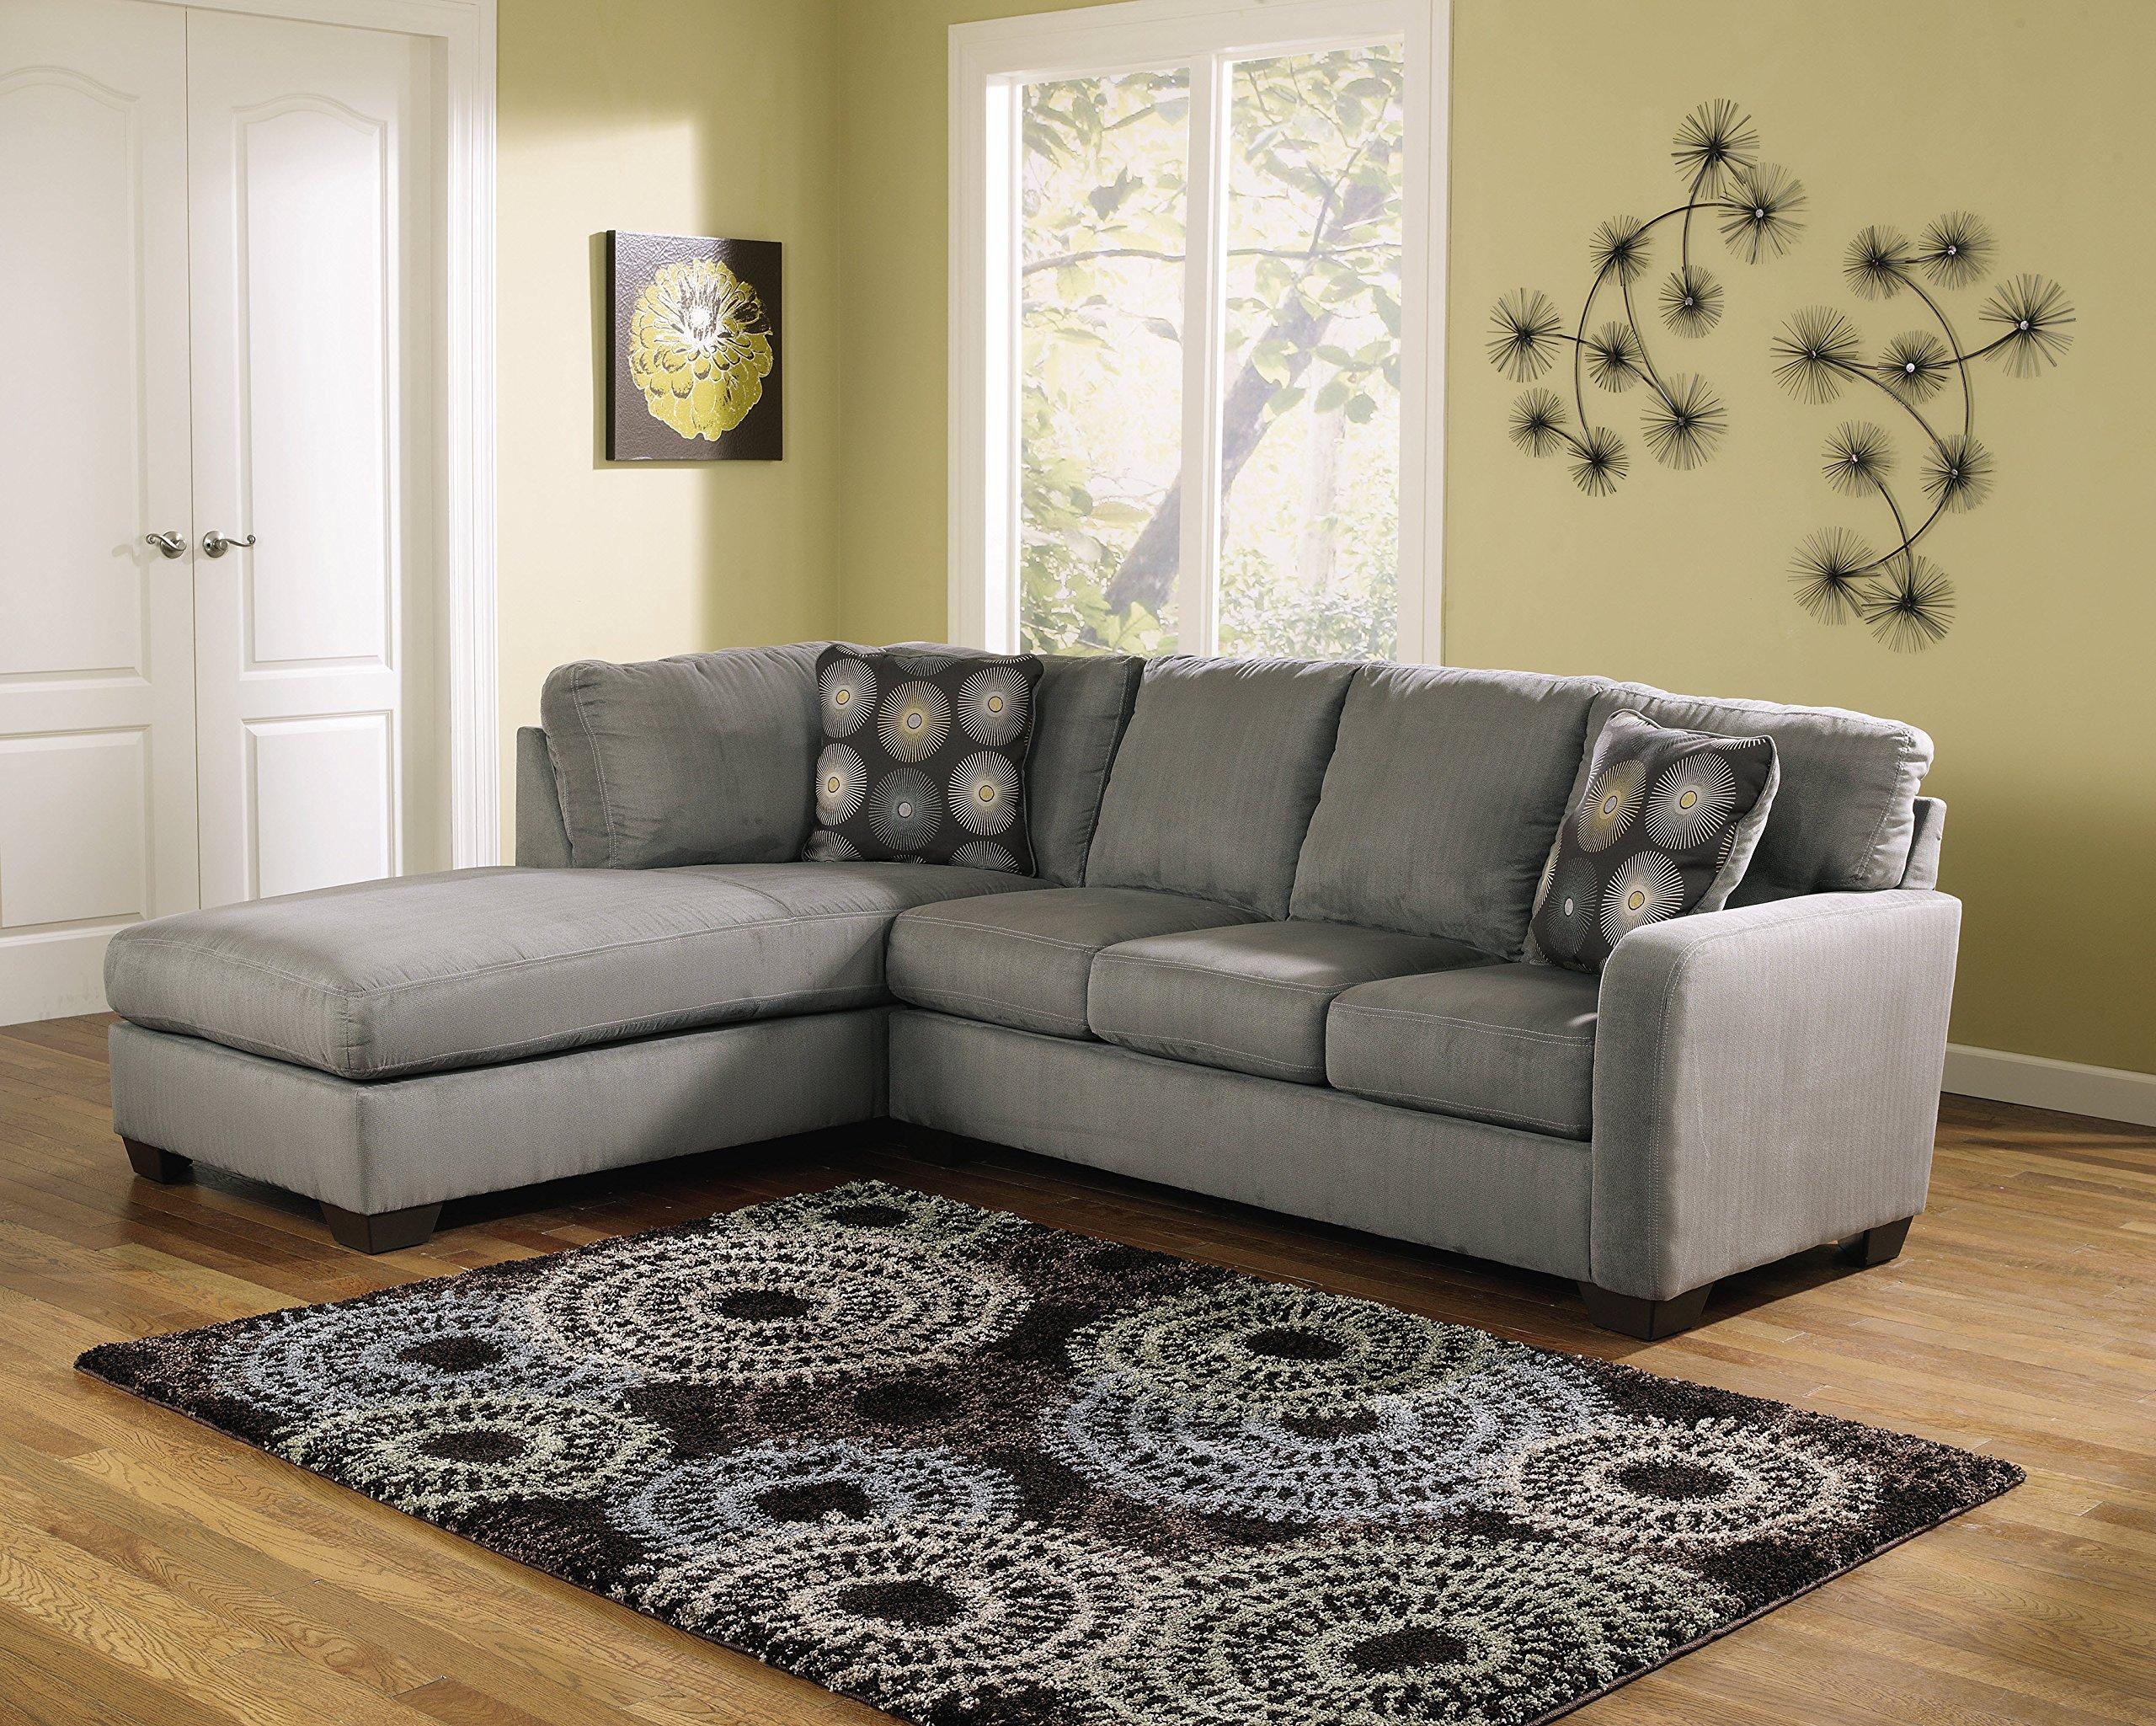 Buy Ashley Furniture Signature Design - Zella 2-Piece ...